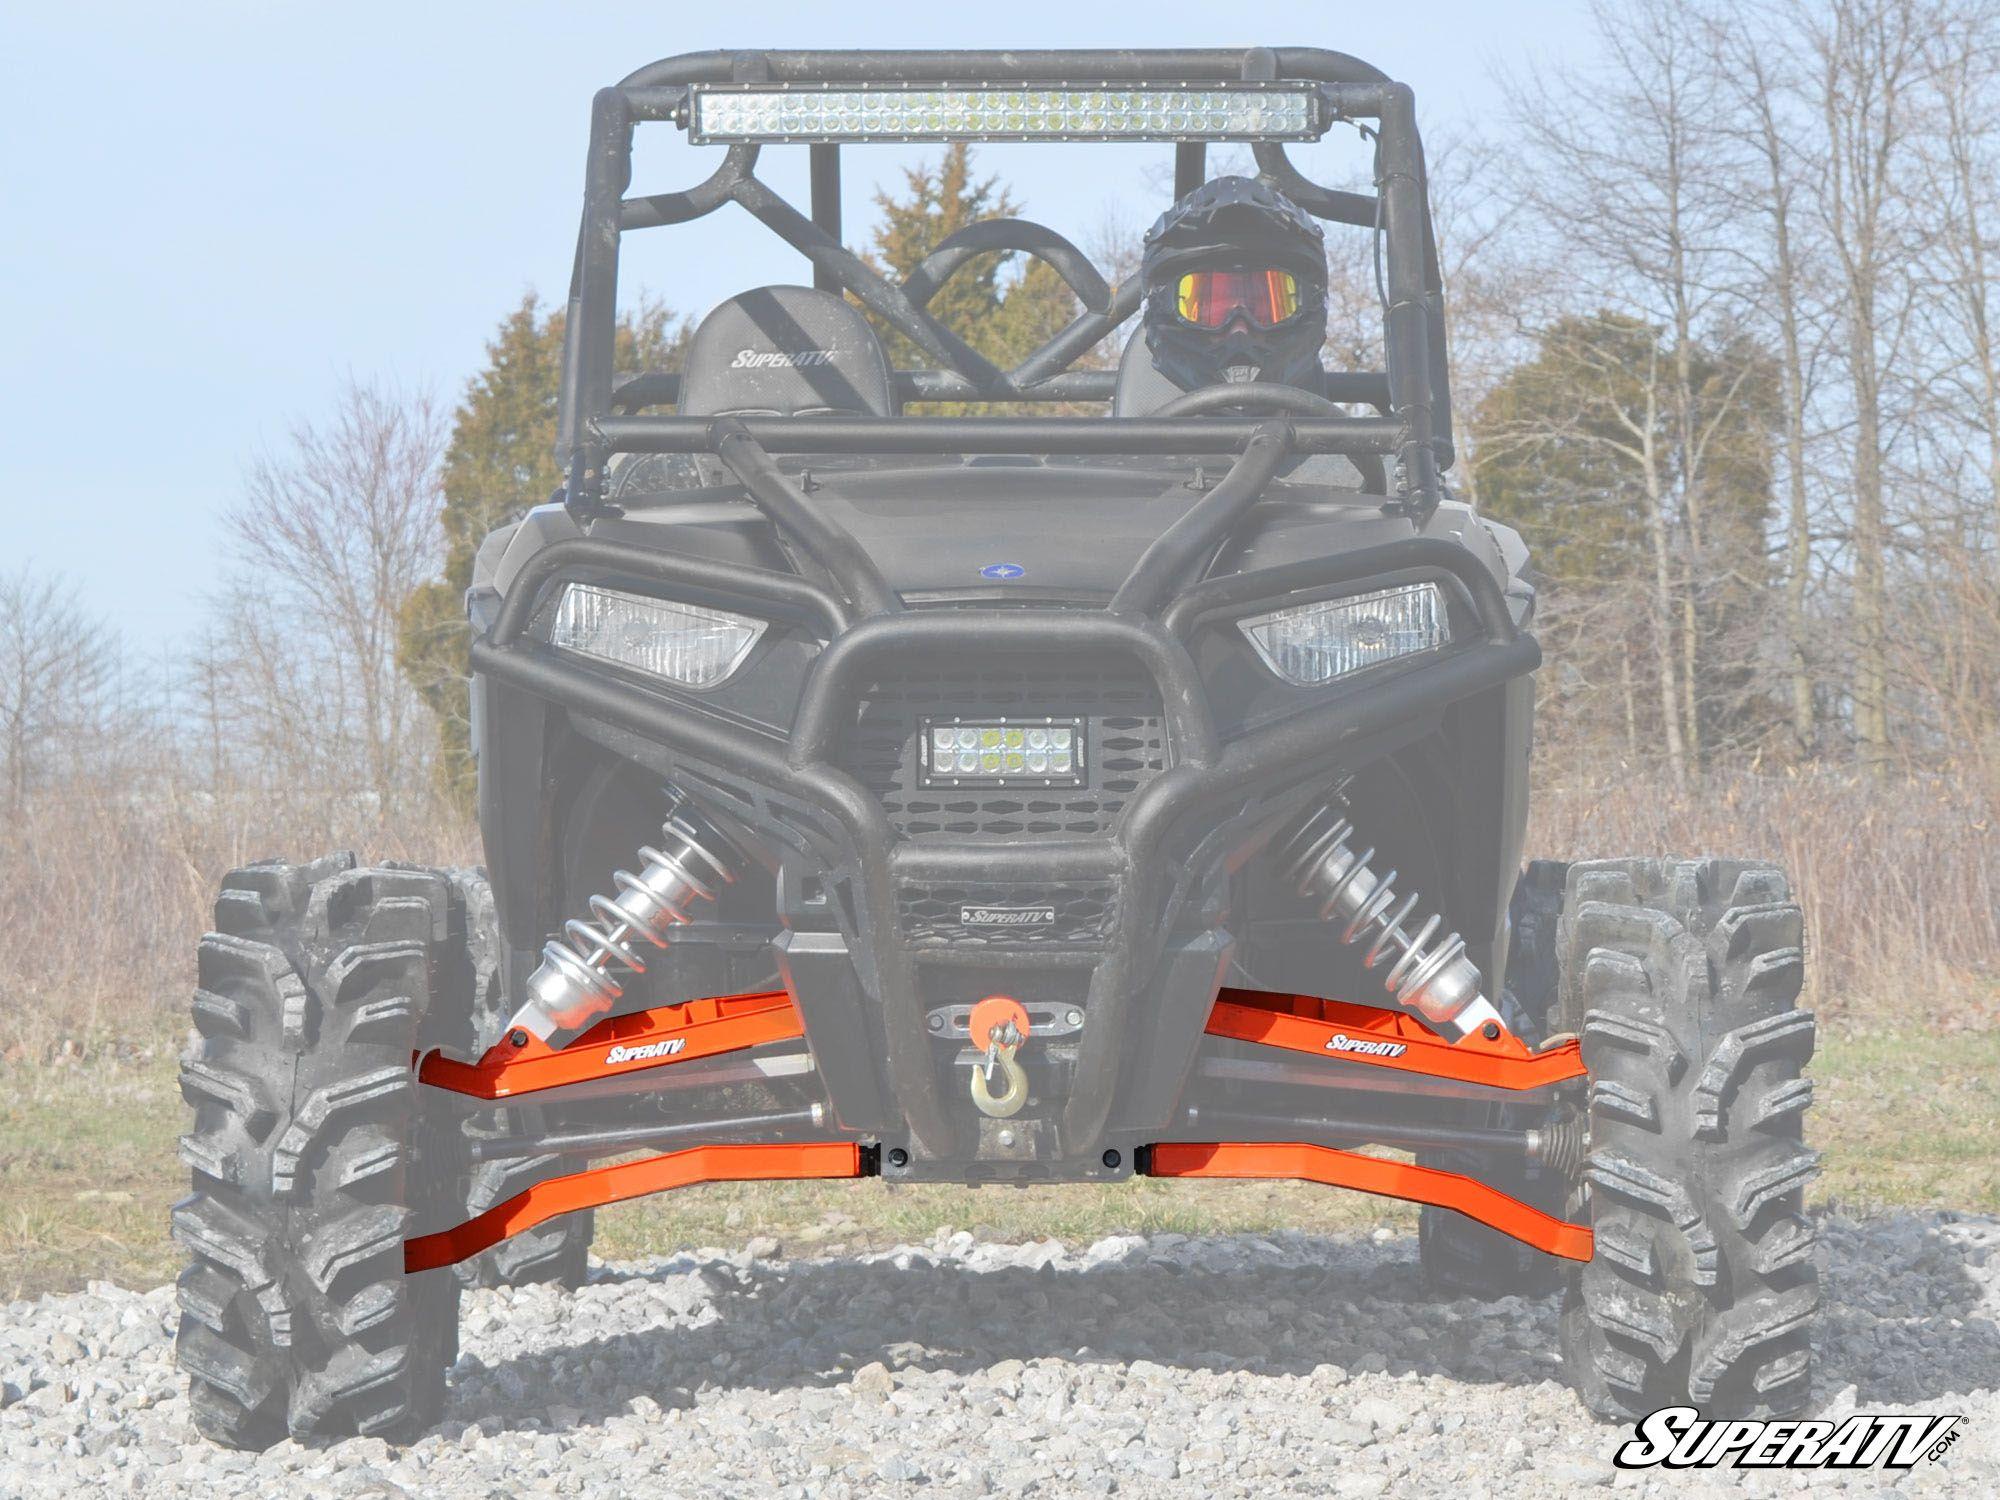 Super ATV 3 inch Long Travel Kit for Polaris RZR S 900 / S 1000